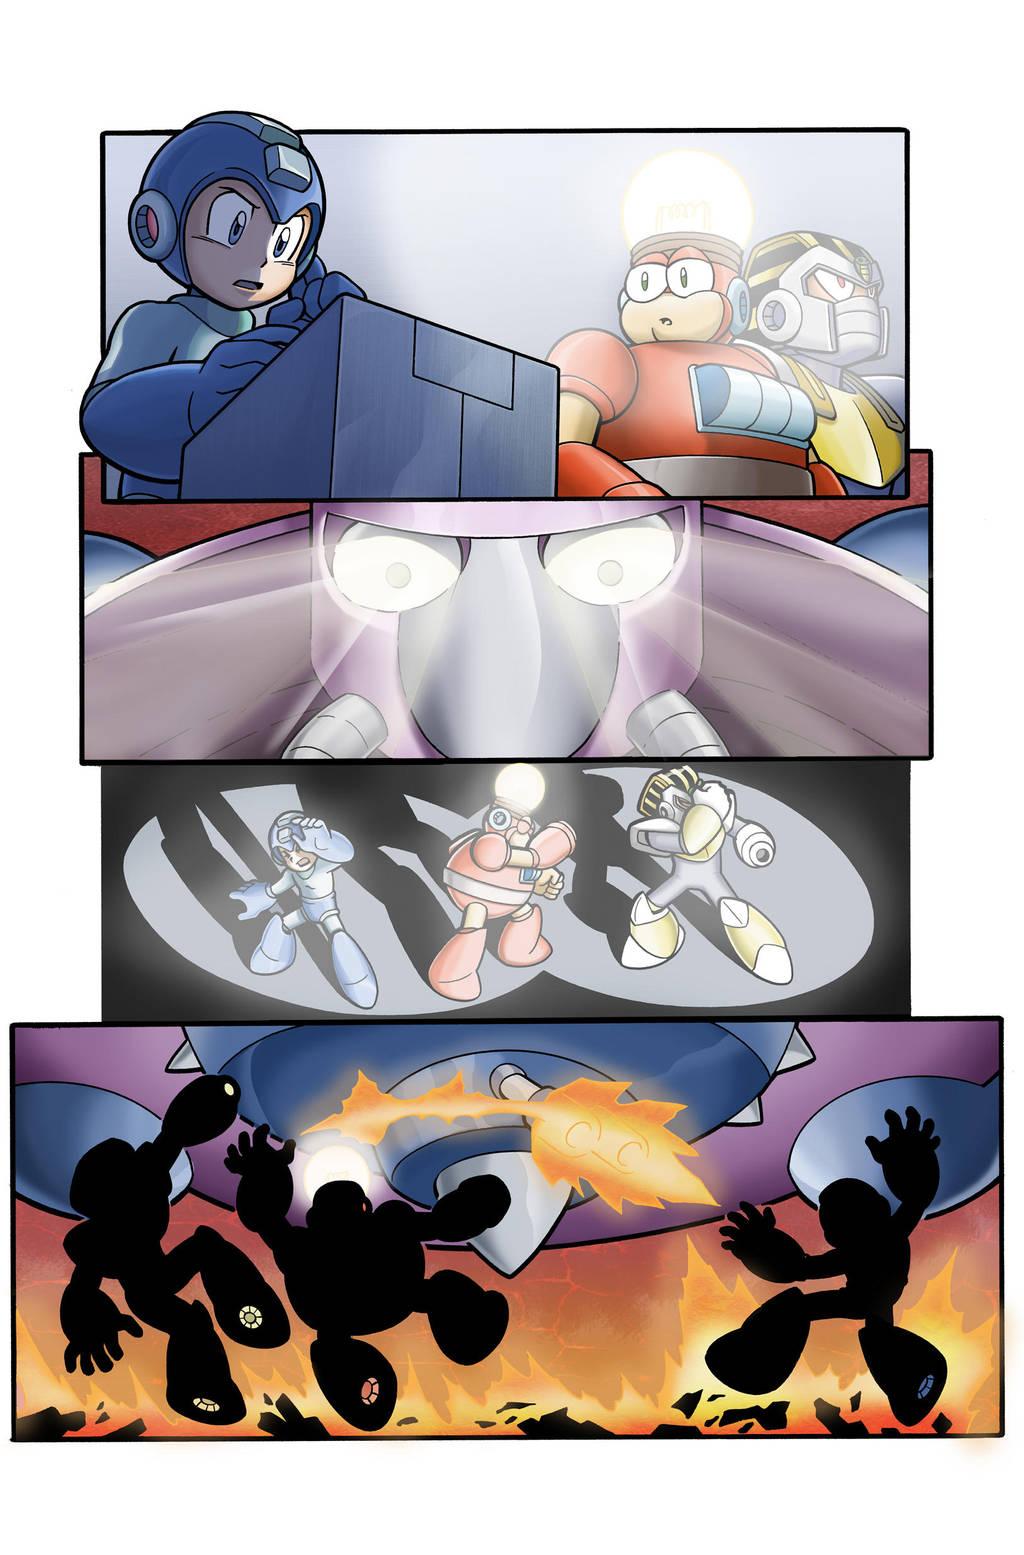 Mega Man Sample 2 by Kminor